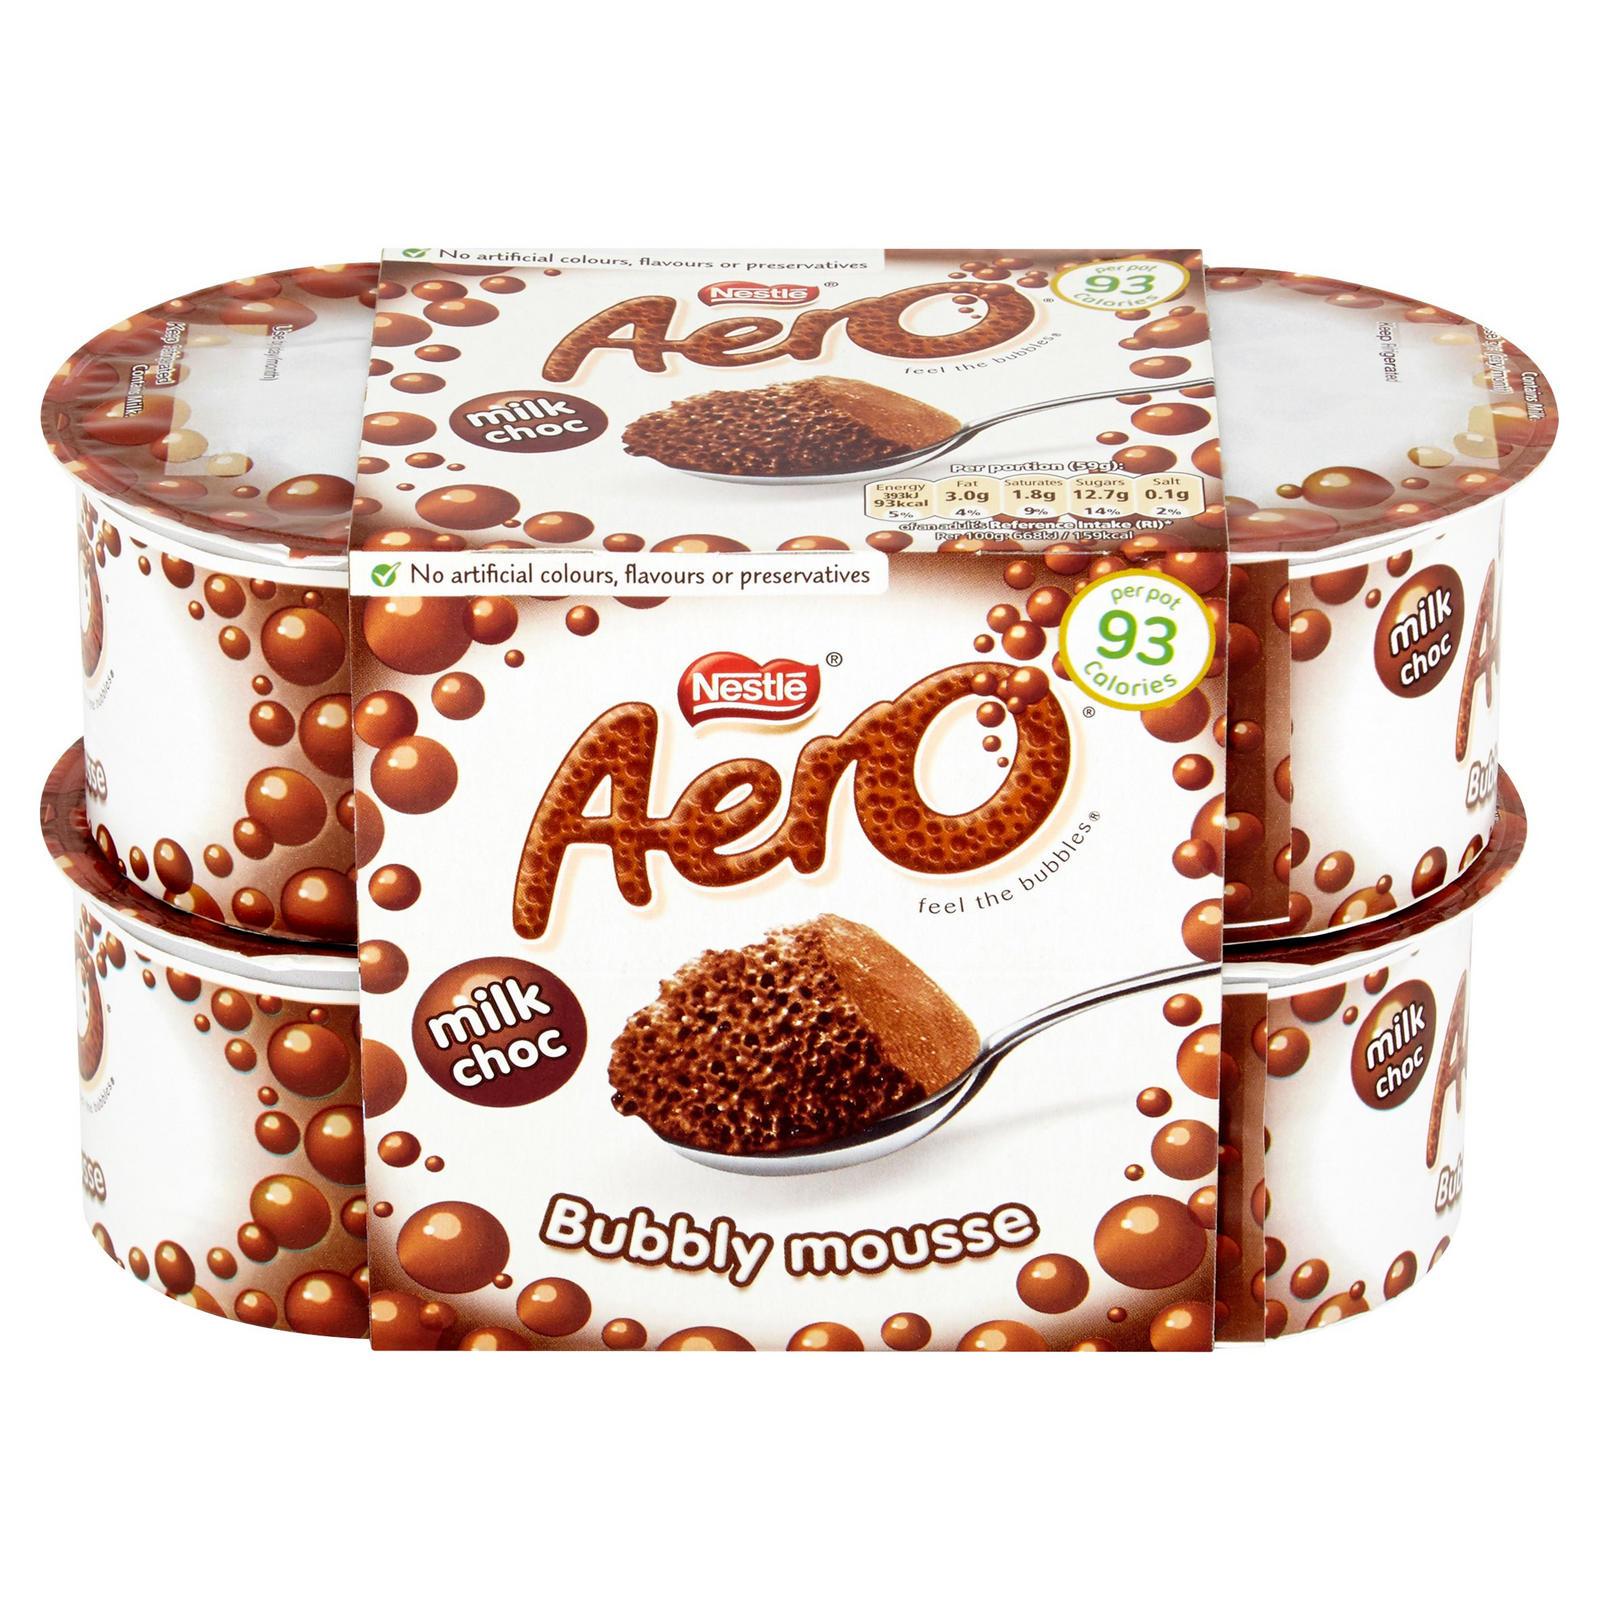 Aero 4 X Milk Chocolate Bubbly Mousse / Milkybar Mousse 4 x 55g (220g) , Now 75p @ Iceland